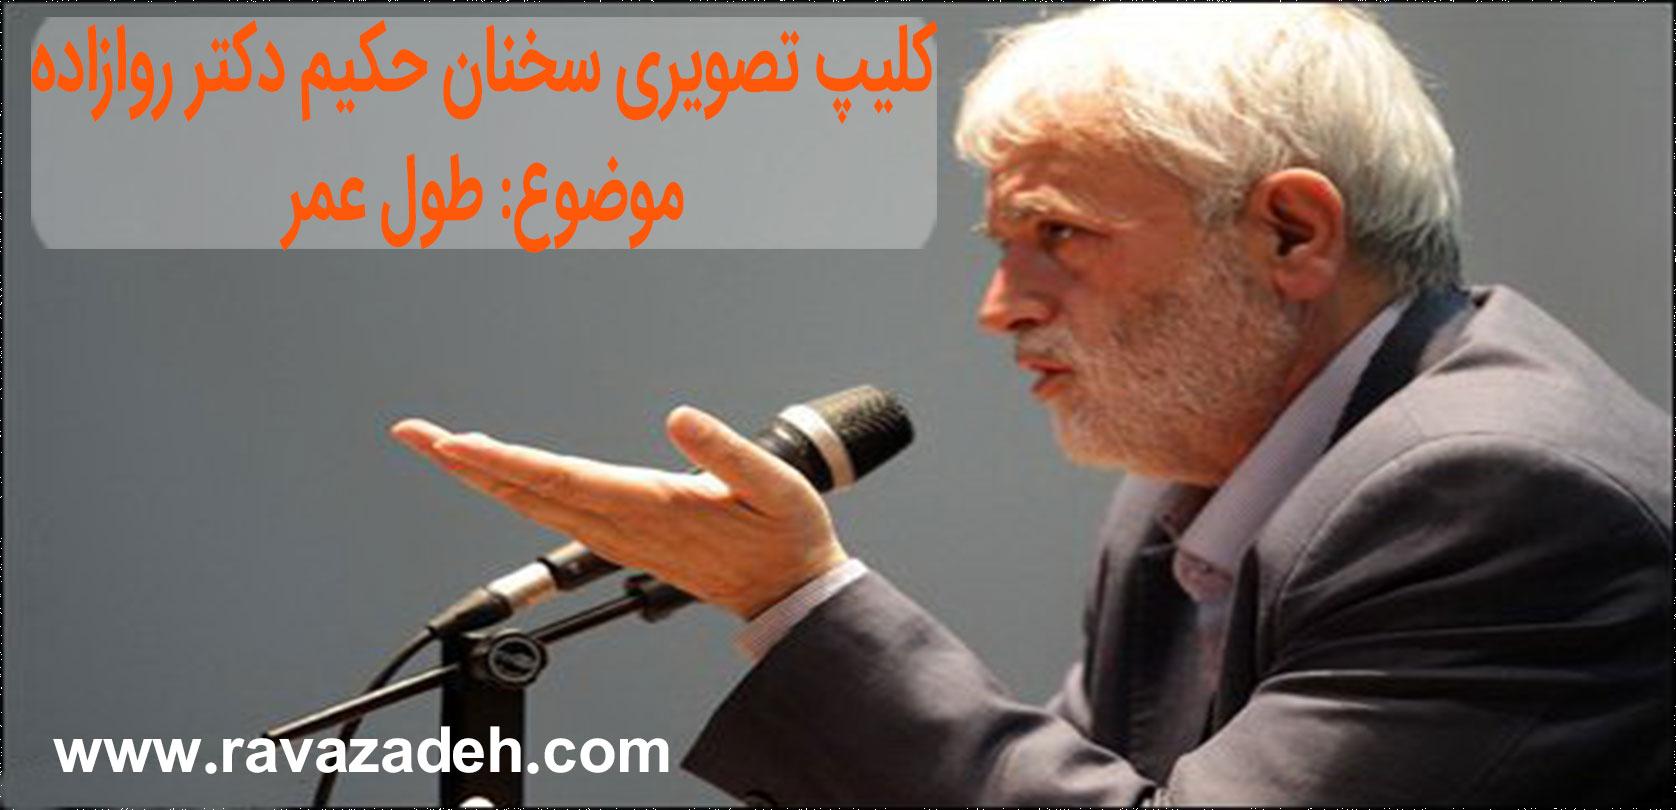 Photo of طول عمر + کلیپ تصویری سخنرانی حکیم دکتر روازاده